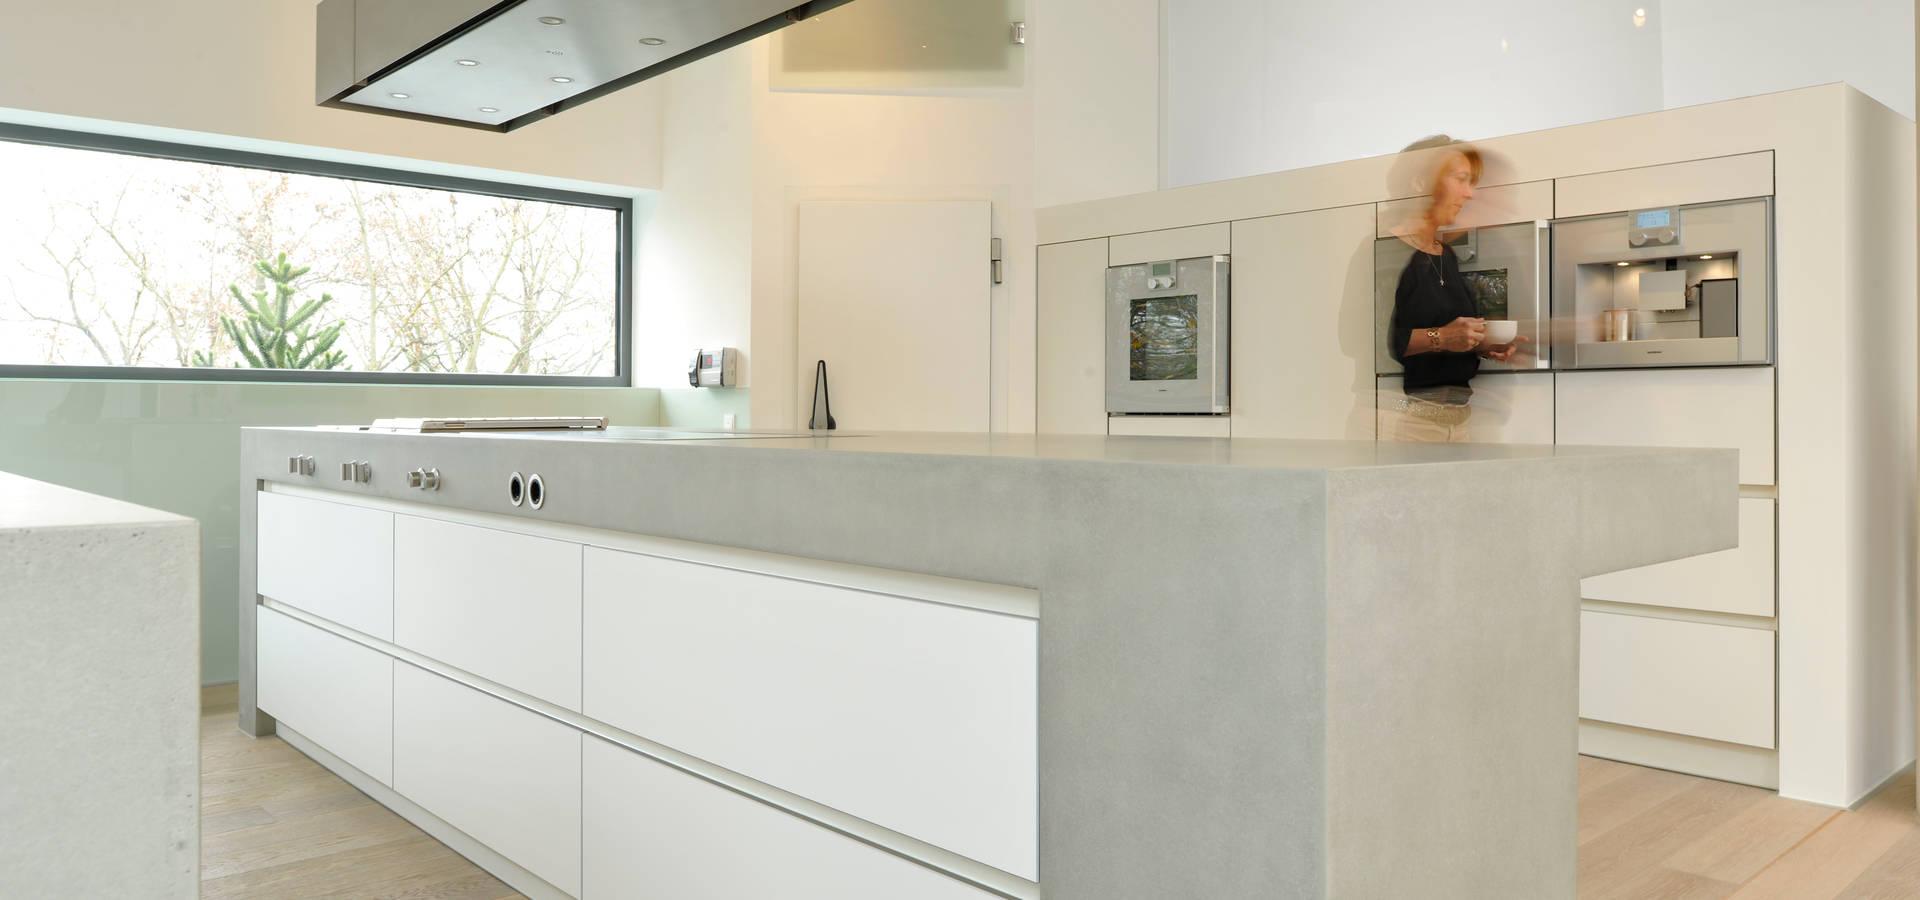 Walter Wendel: Raumausstatter U0026 Interior Designer In Ockenheim | Homify